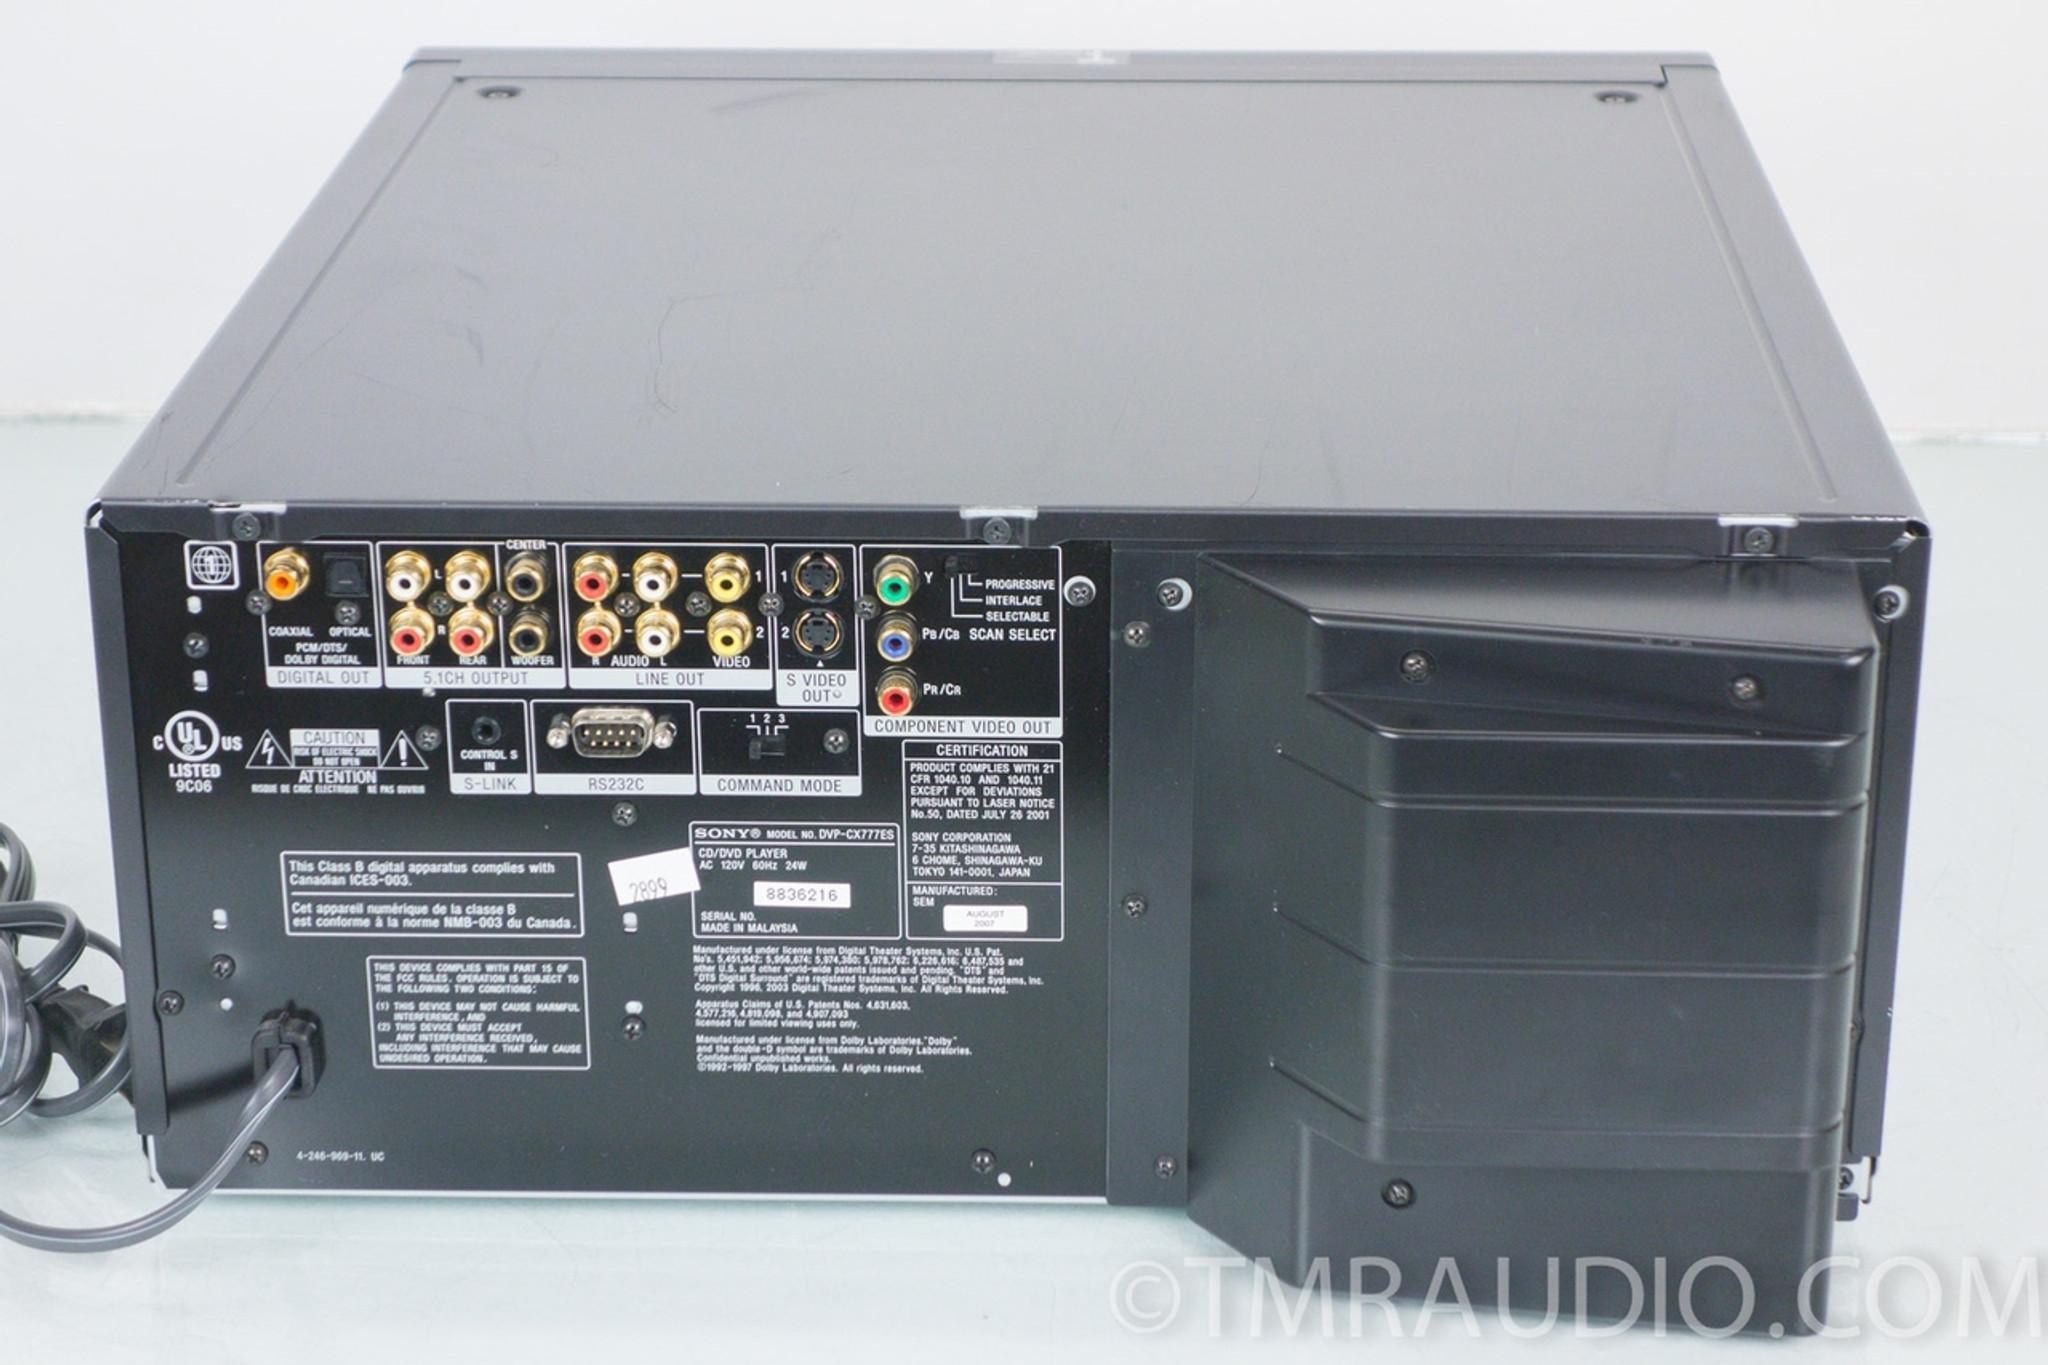 Sony DVP-CX777ES CD / DVD / SACD 400 Disc Changer / Player